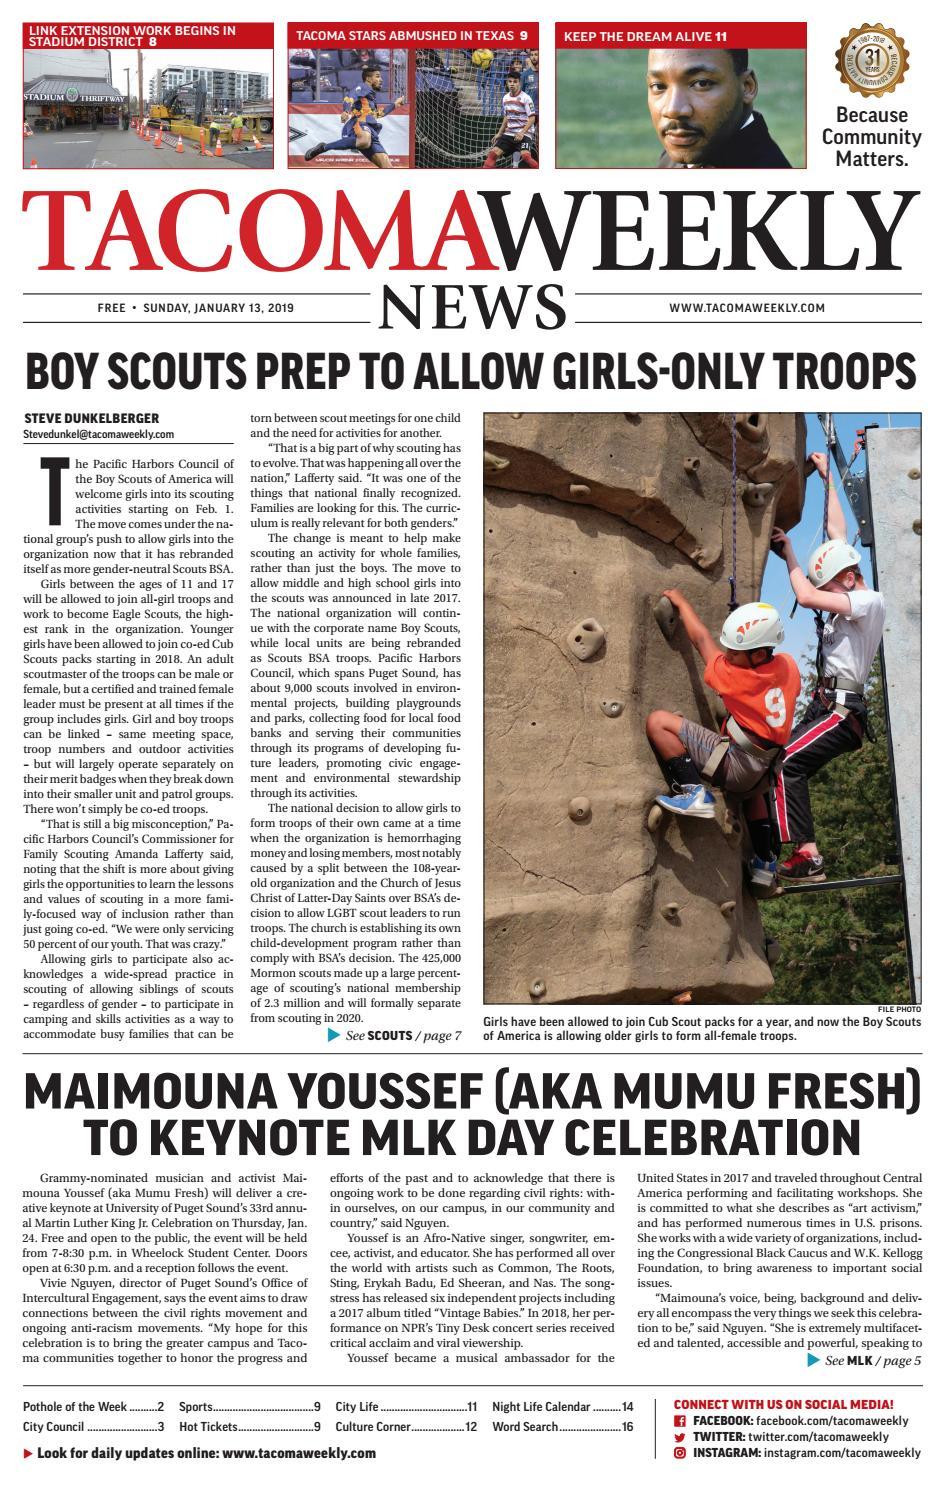 Tacoma Weekly 01.13.19 by Tacoma Weekly News - issuu 7bd32a66c